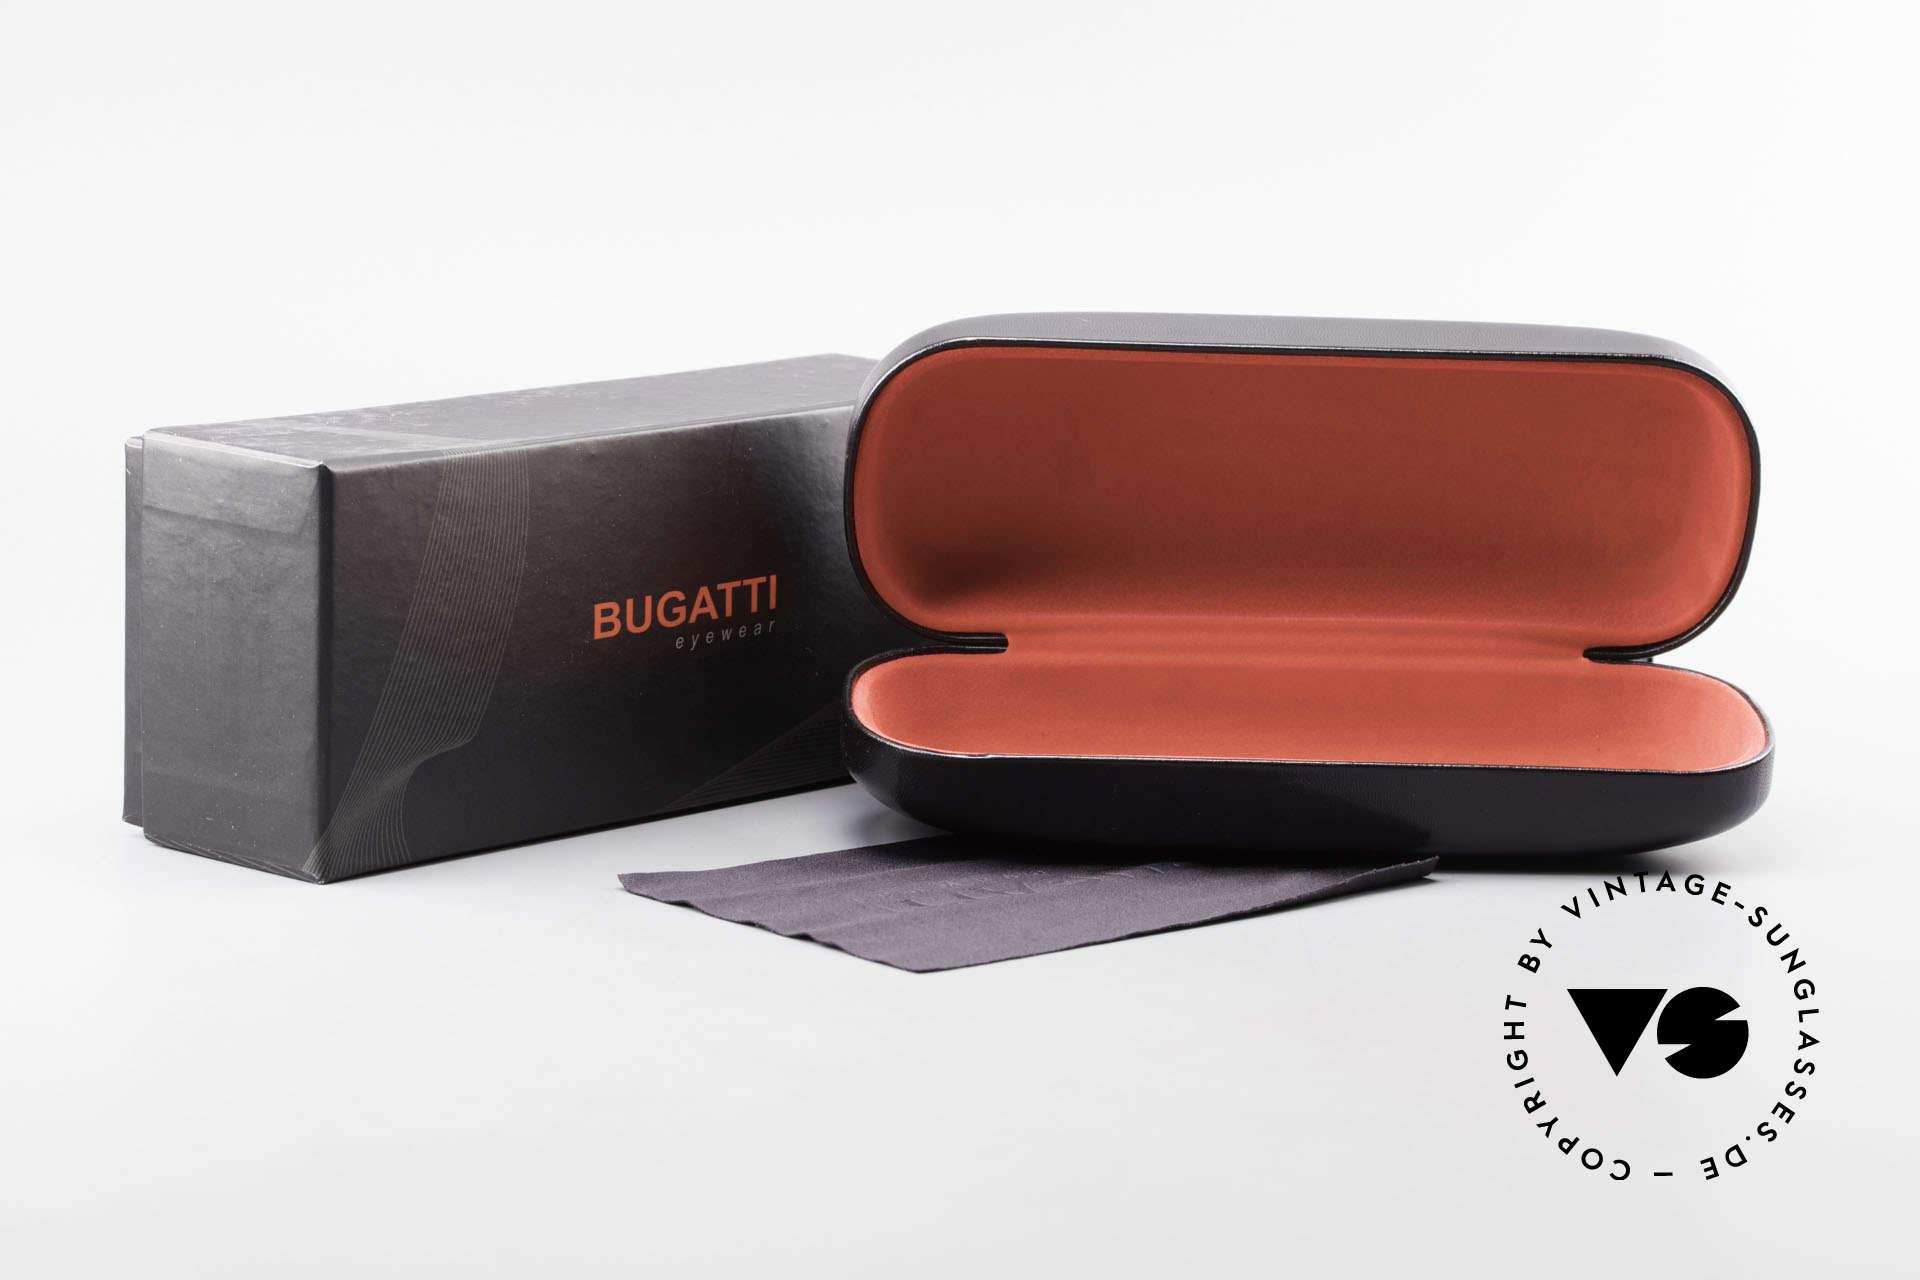 Bugatti 547 Walnut Wood Luxury Glasses L, Size: large, Made for Men